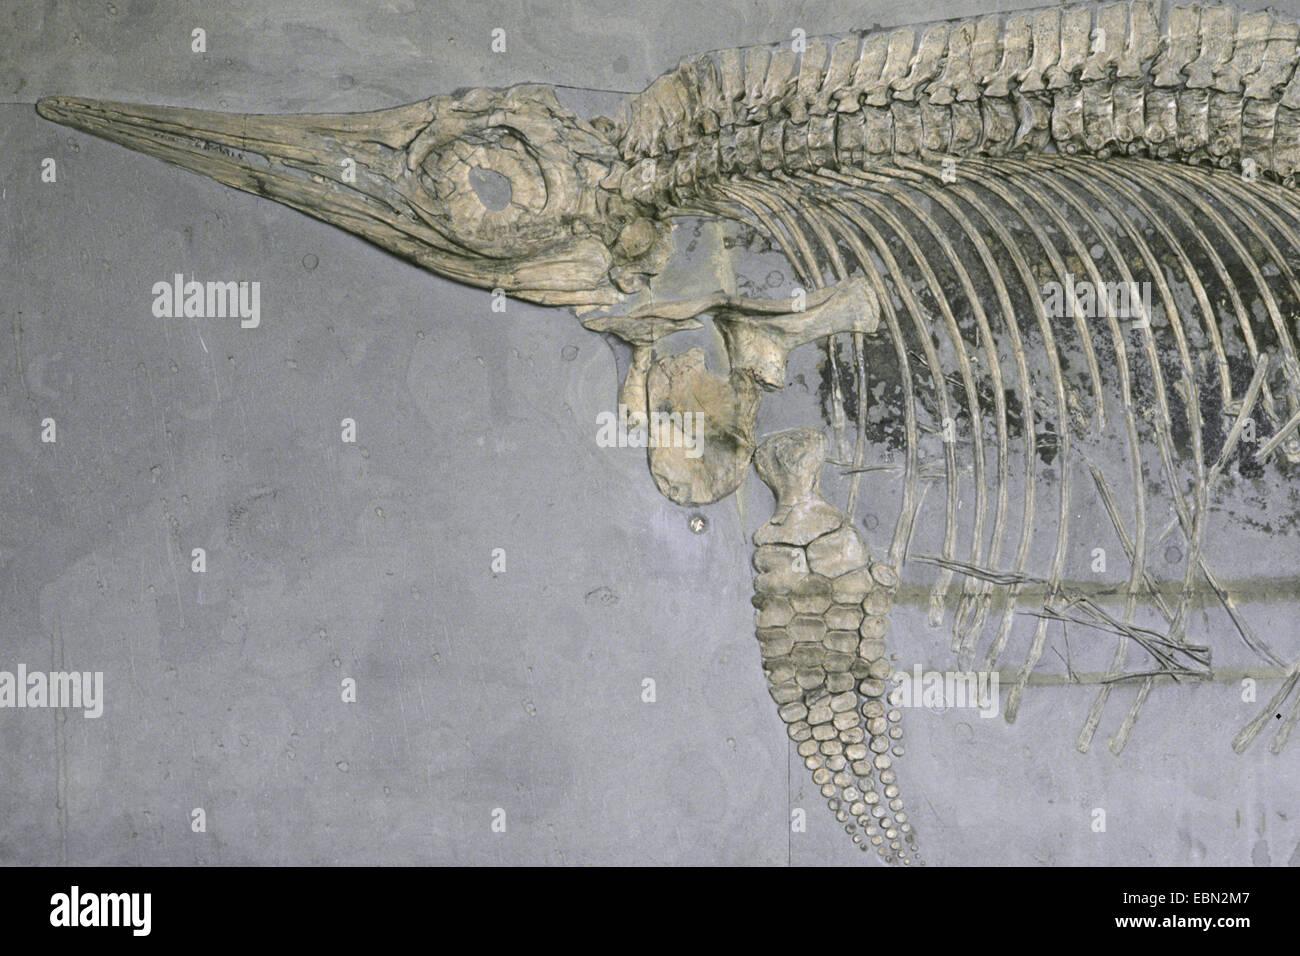 Ichthyosaurus (Ichthyosaurus stenopterygius), fossil of an Ichthyosaurus - Stock Image